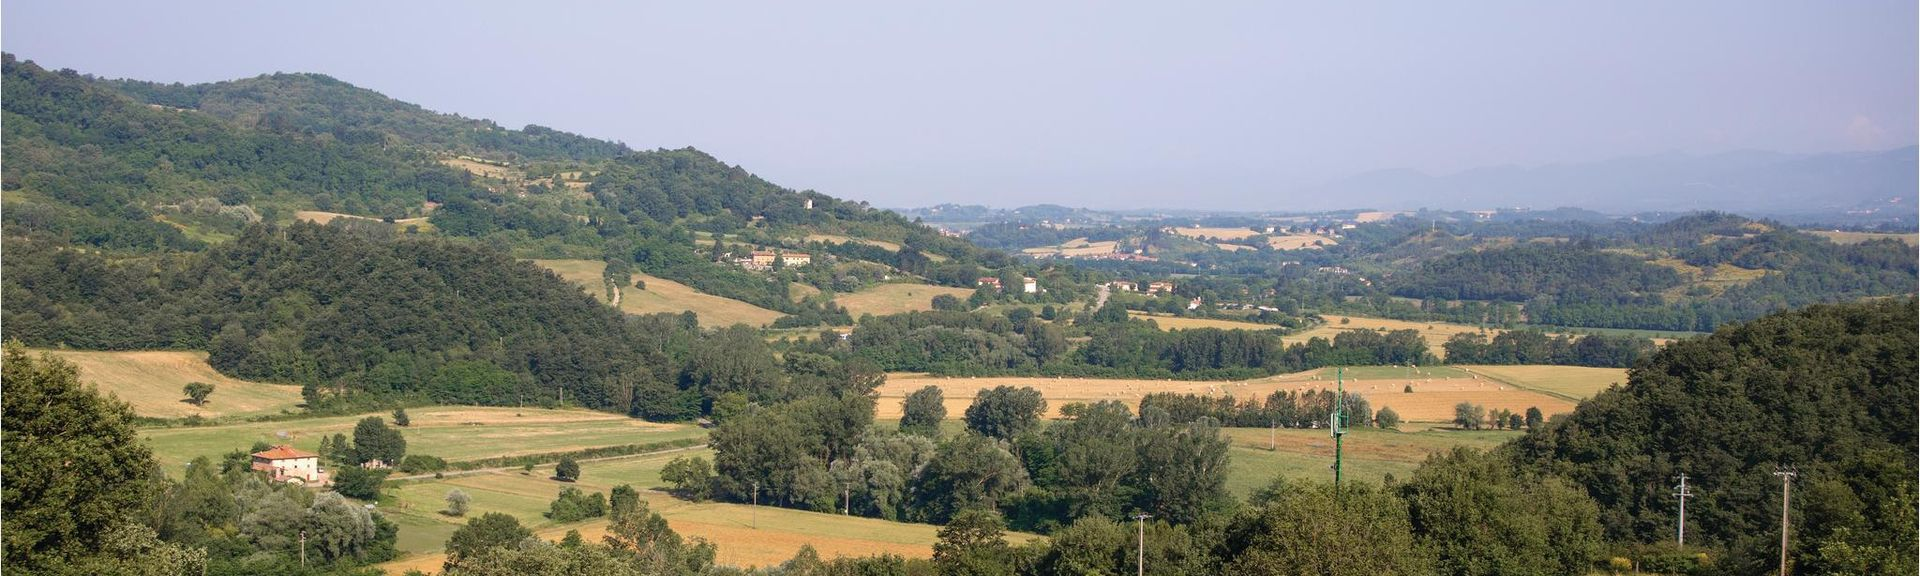 Palazzuolo sul Senio, Toscane, Italie